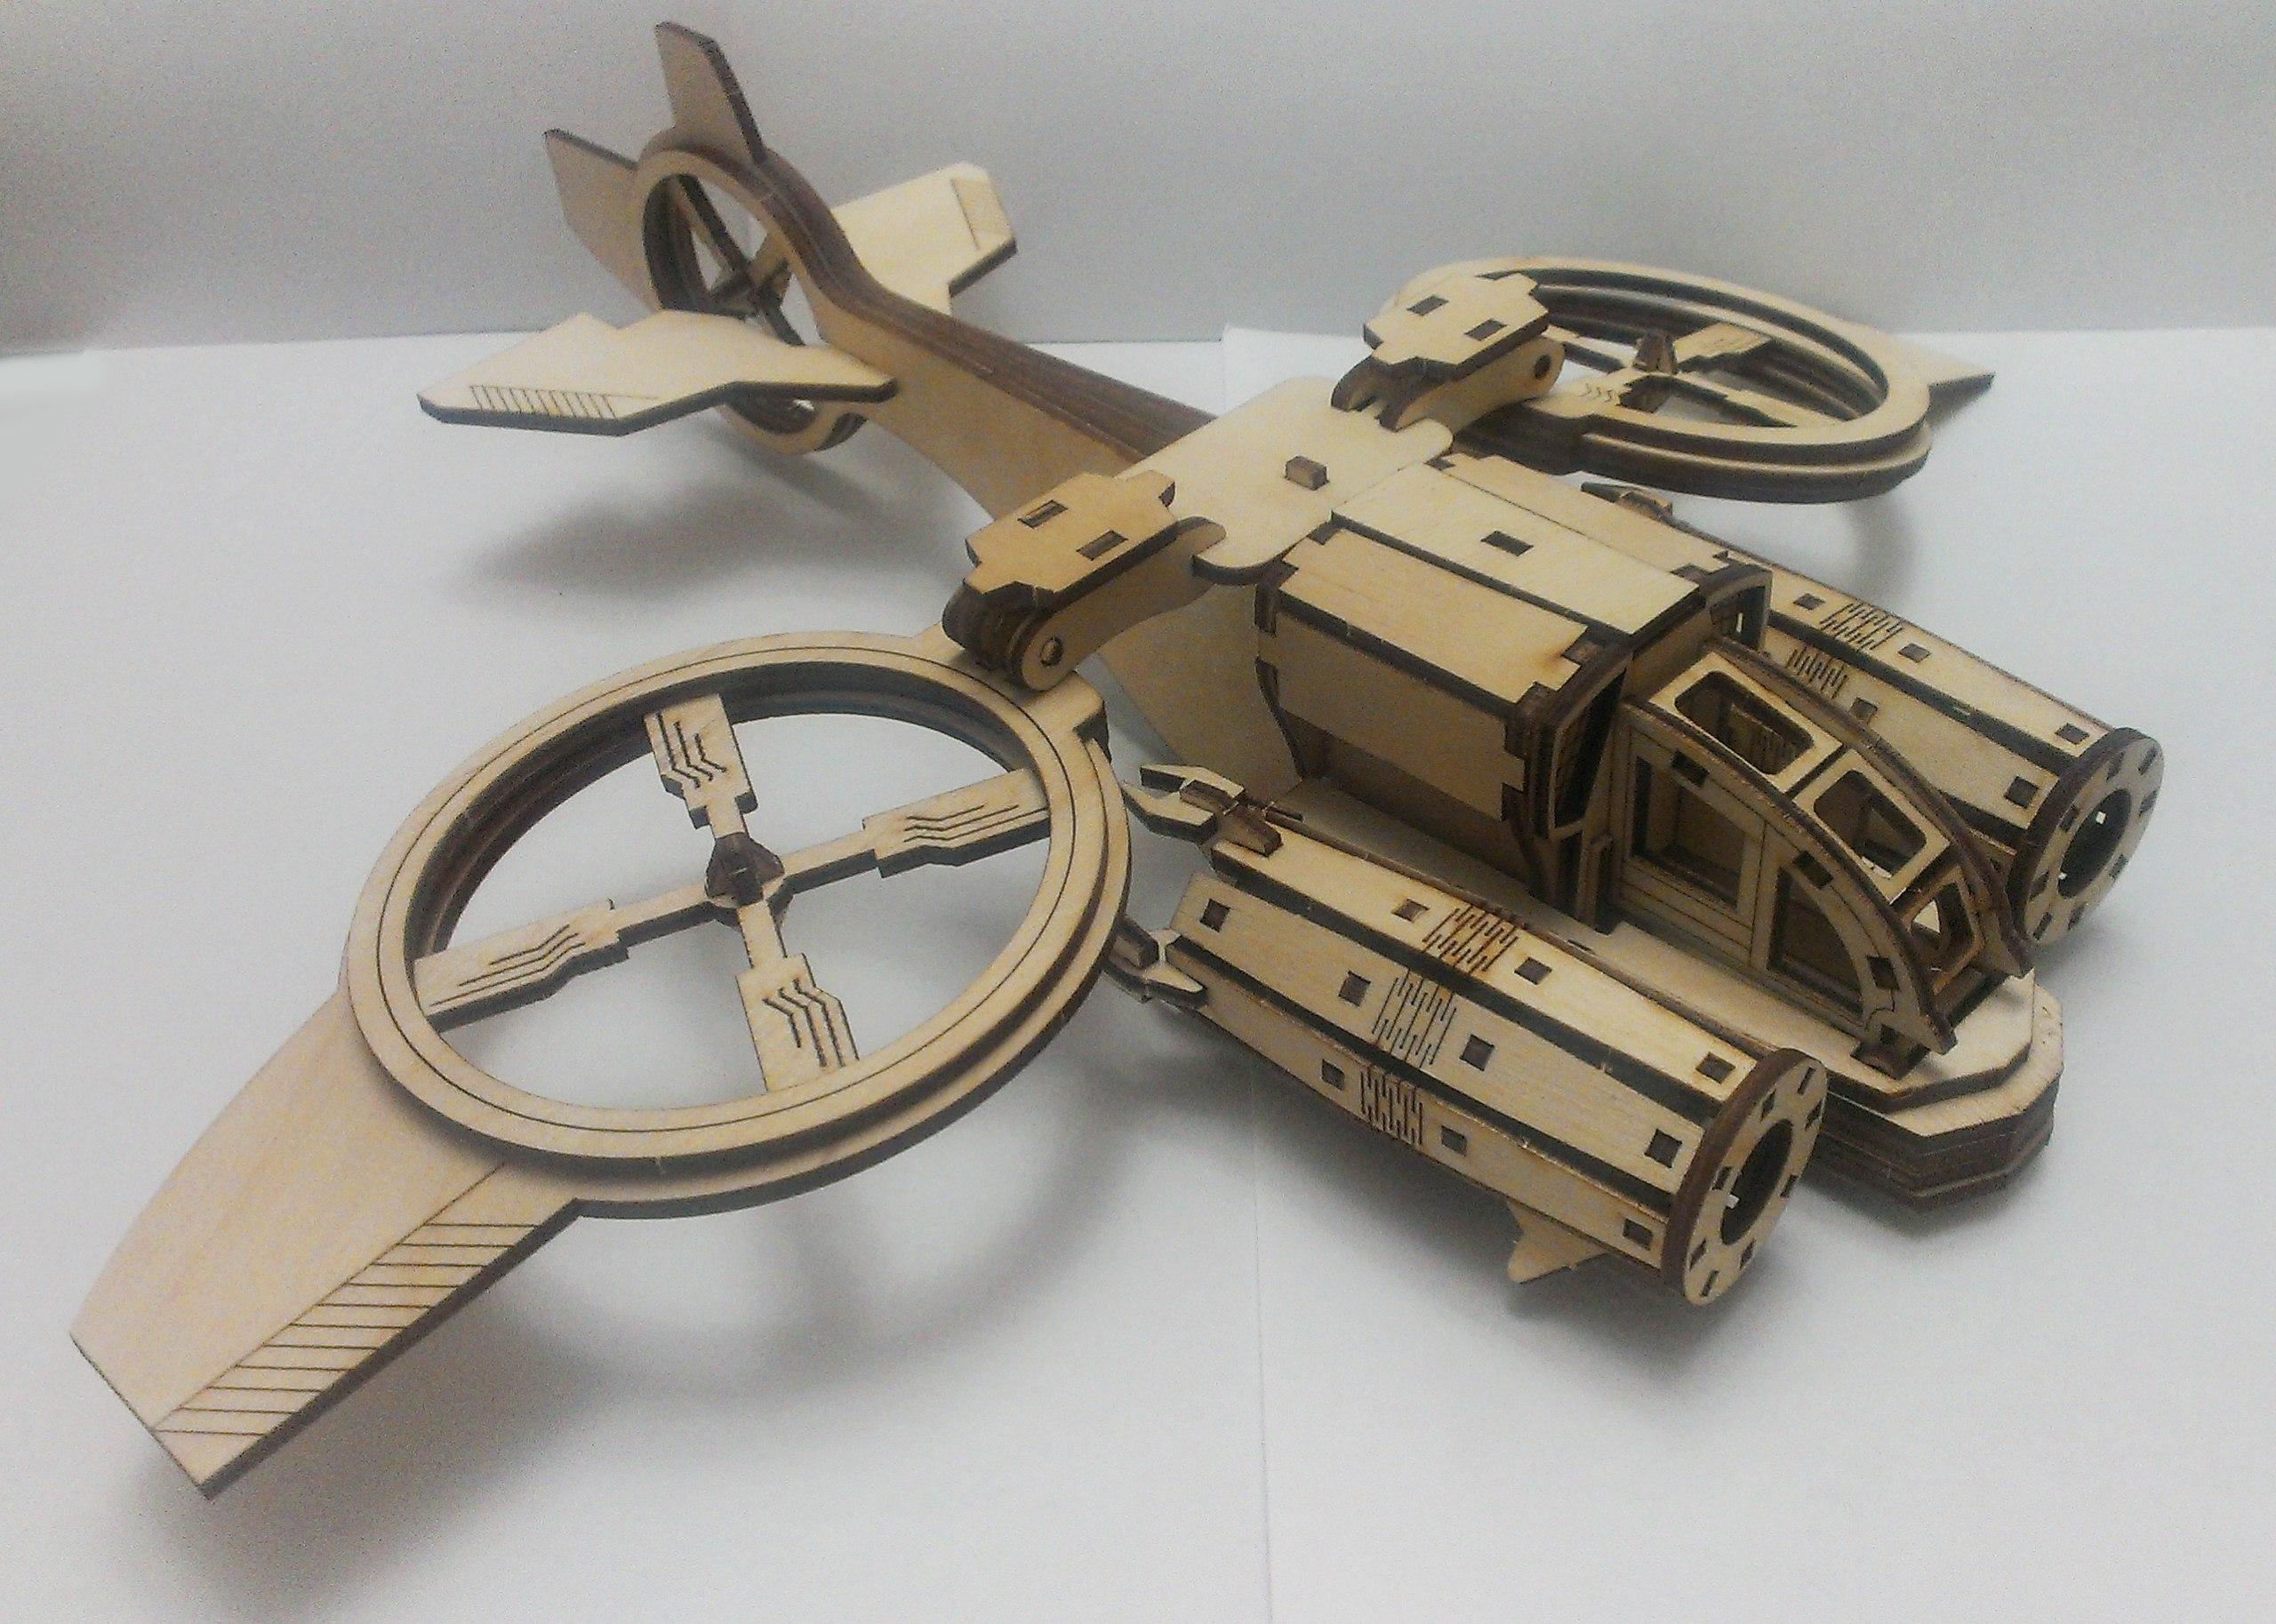 Helicóptero Banshi Avatar Sa-2 Samson Similar. Mdf Laser Free Vector